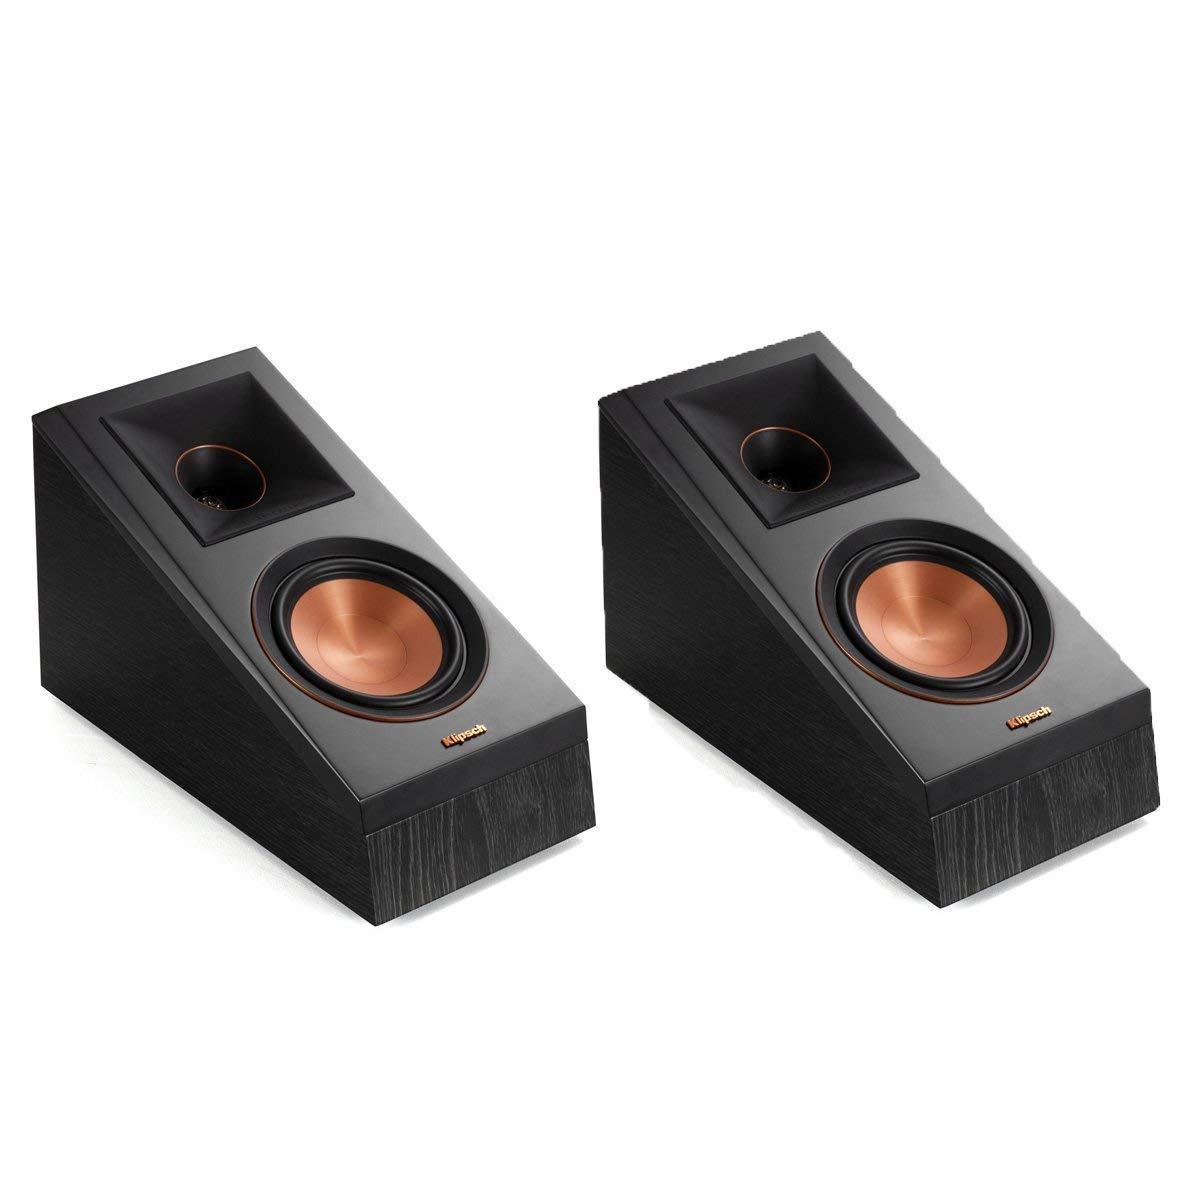 Klipsch RP-500SA Reference Premiere Dolby Atmos Speakers - Pair (Ebony) (Renewed)